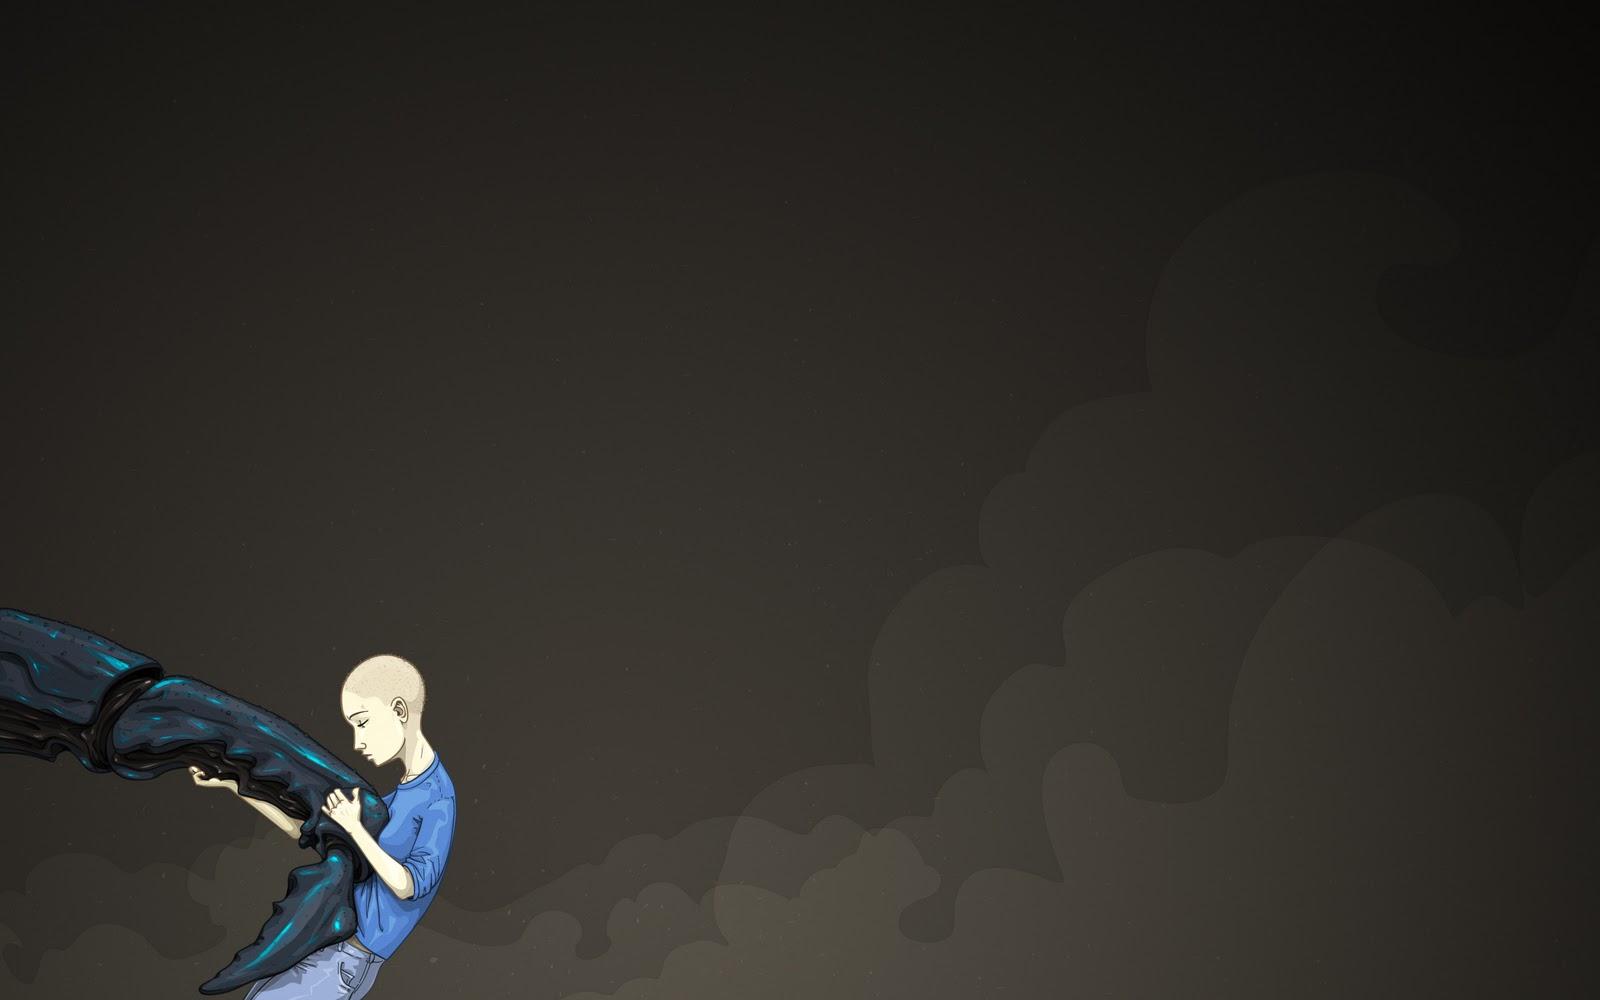 Anime Guy Cool Wallpapers Cool Anime Guy Desktop Backgrounds Anime 1600x1000